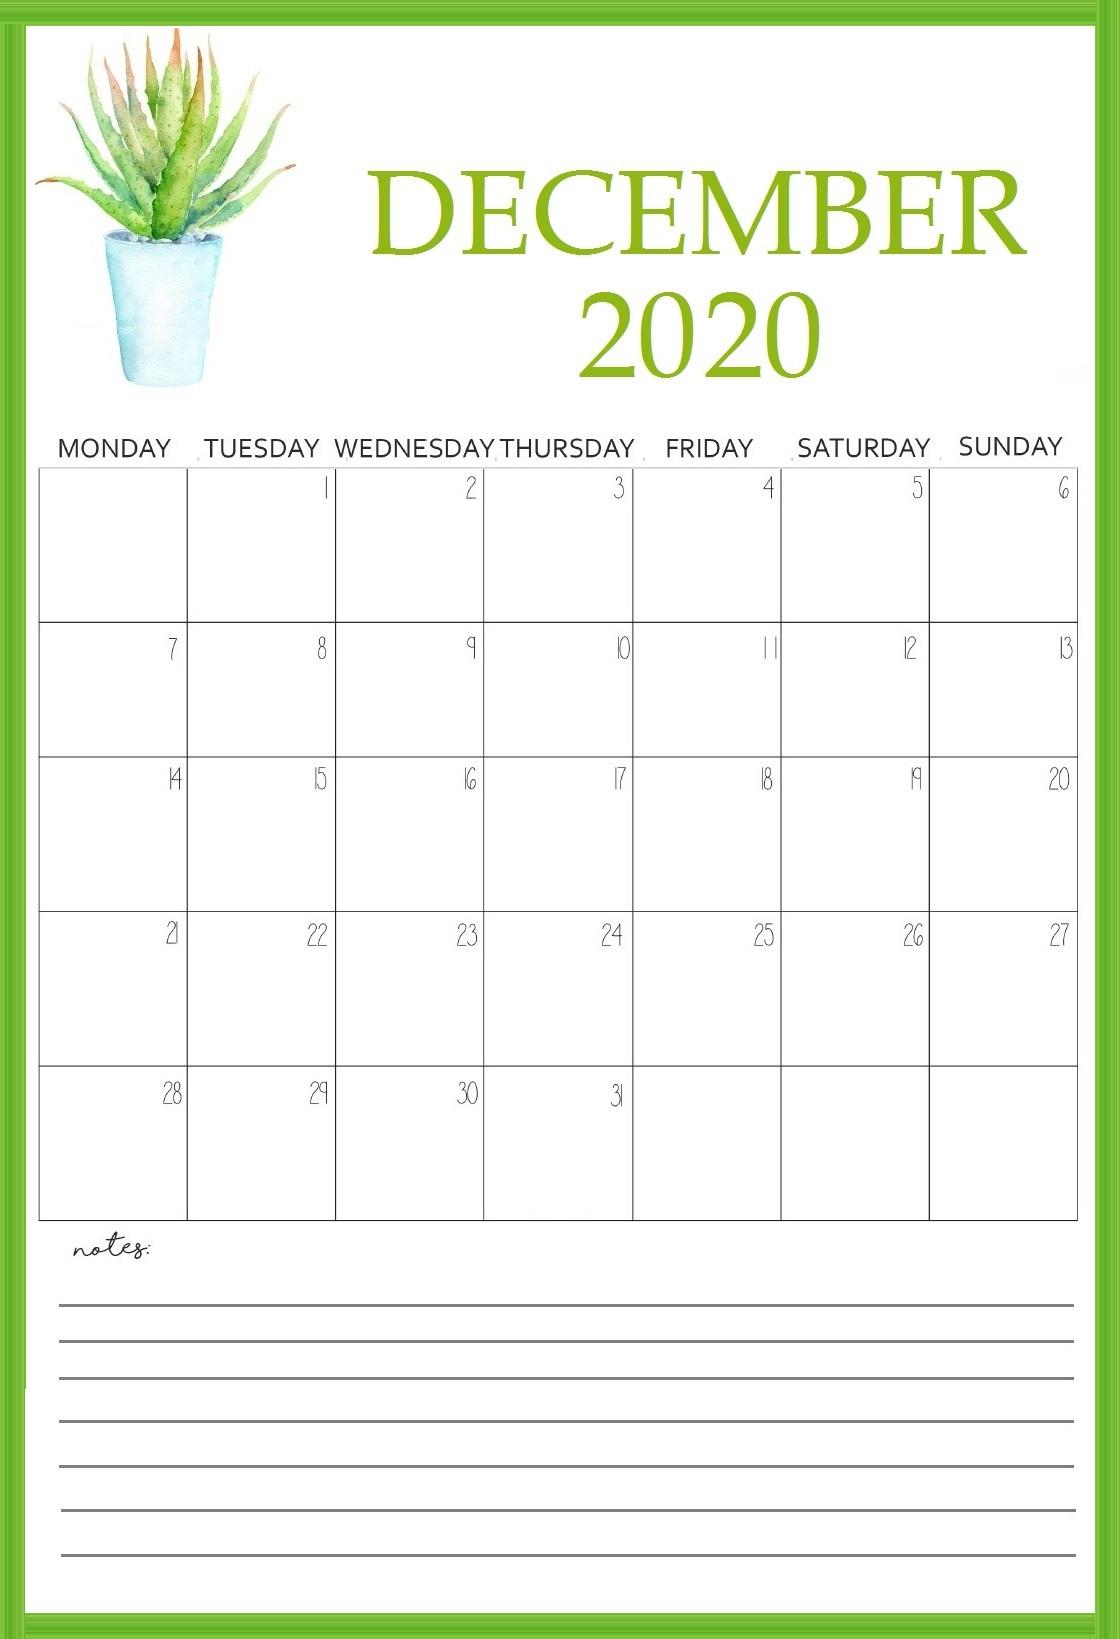 Printable December 2020 Wall Calendar